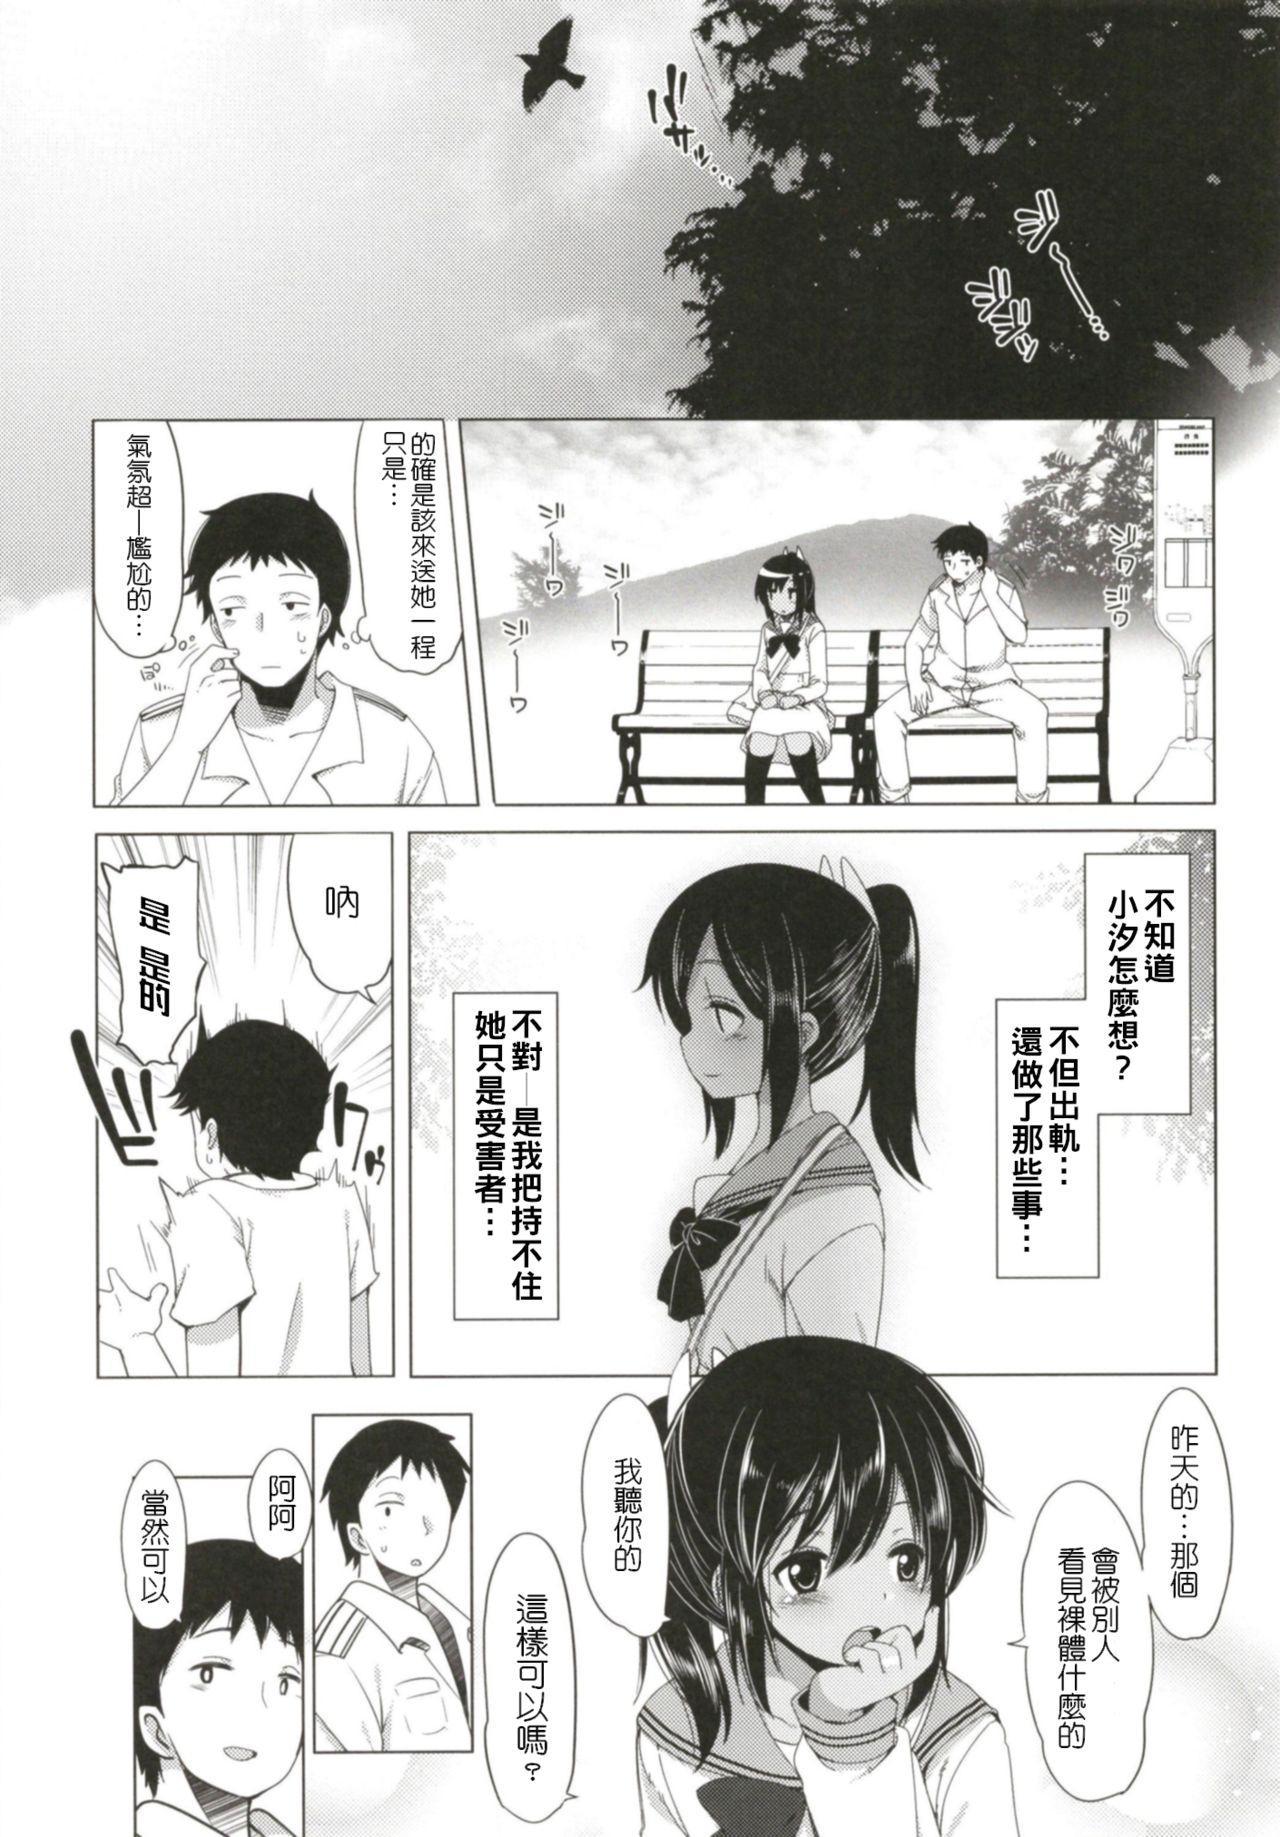 [French letter (Fujisaki Hikari)] Hitonatsu no Ayamachi -I-401 Soushuuhen- (Kantai Collection -KanColle-) [Chinese] [Digital] 29